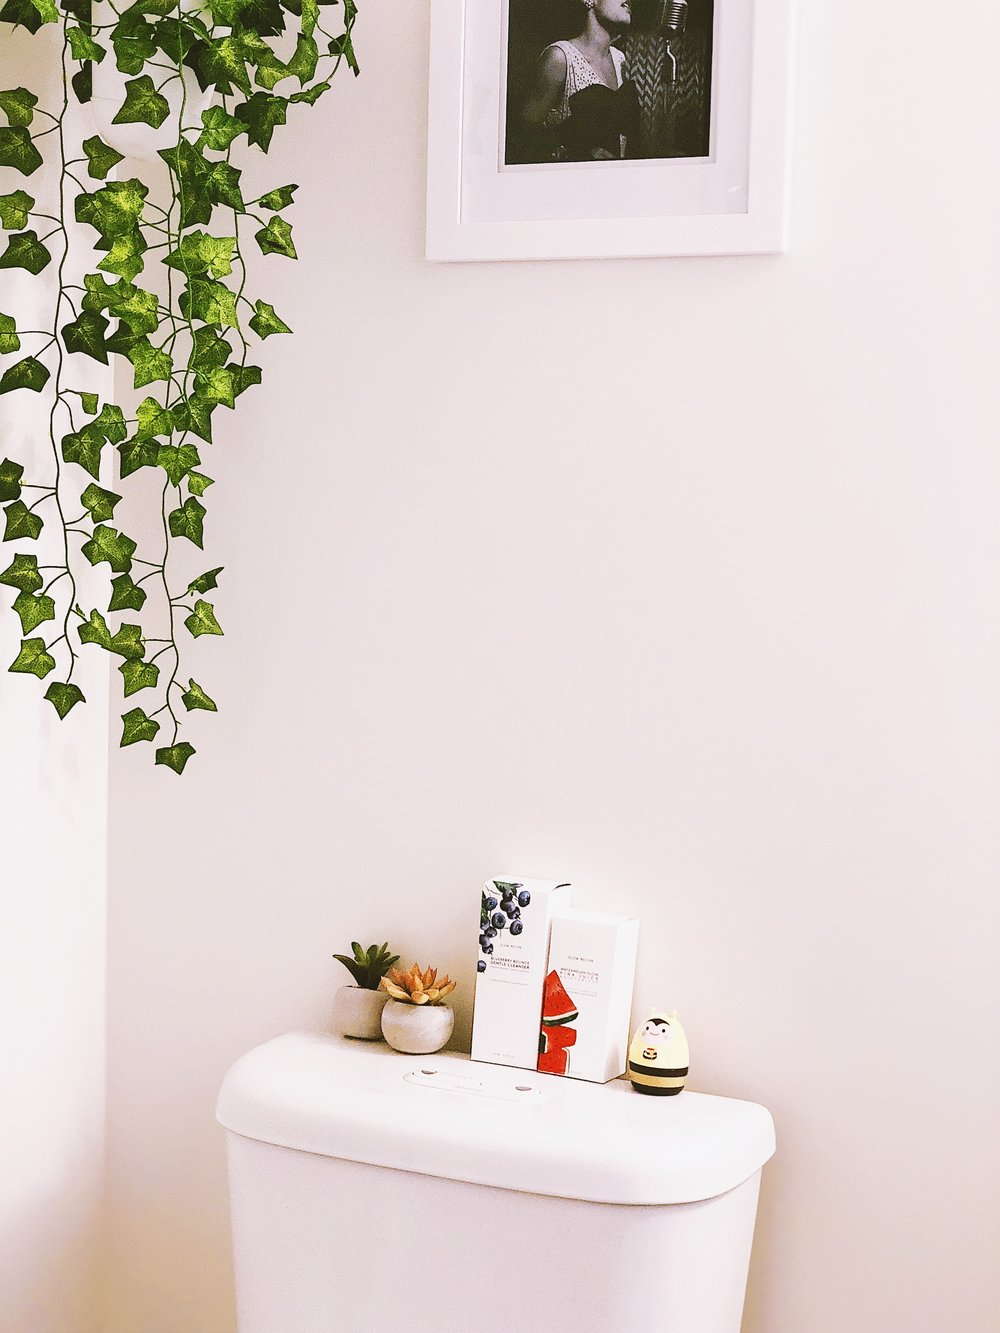 San Francisco Apartment Tour - Bathroom